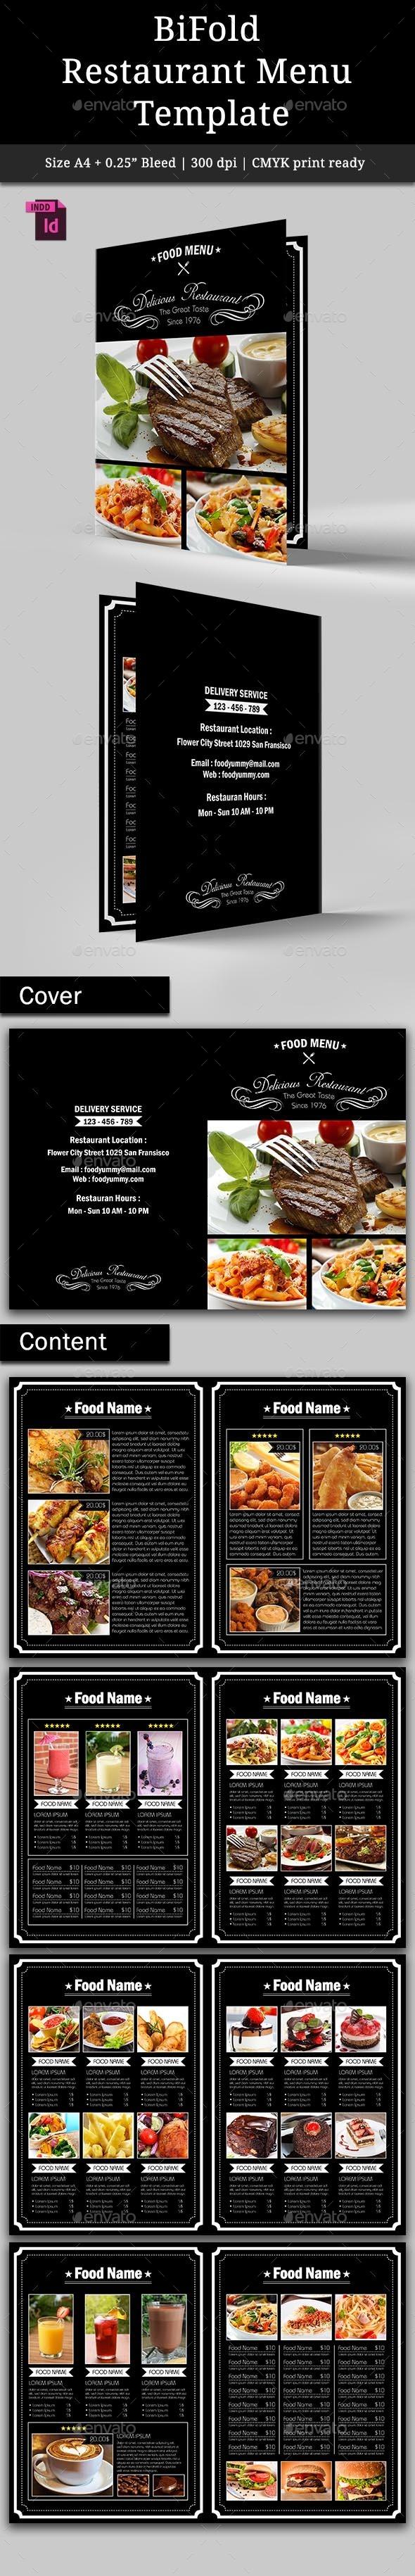 GraphicRiver BiFold Restaurant Menu Vol 2 9309042